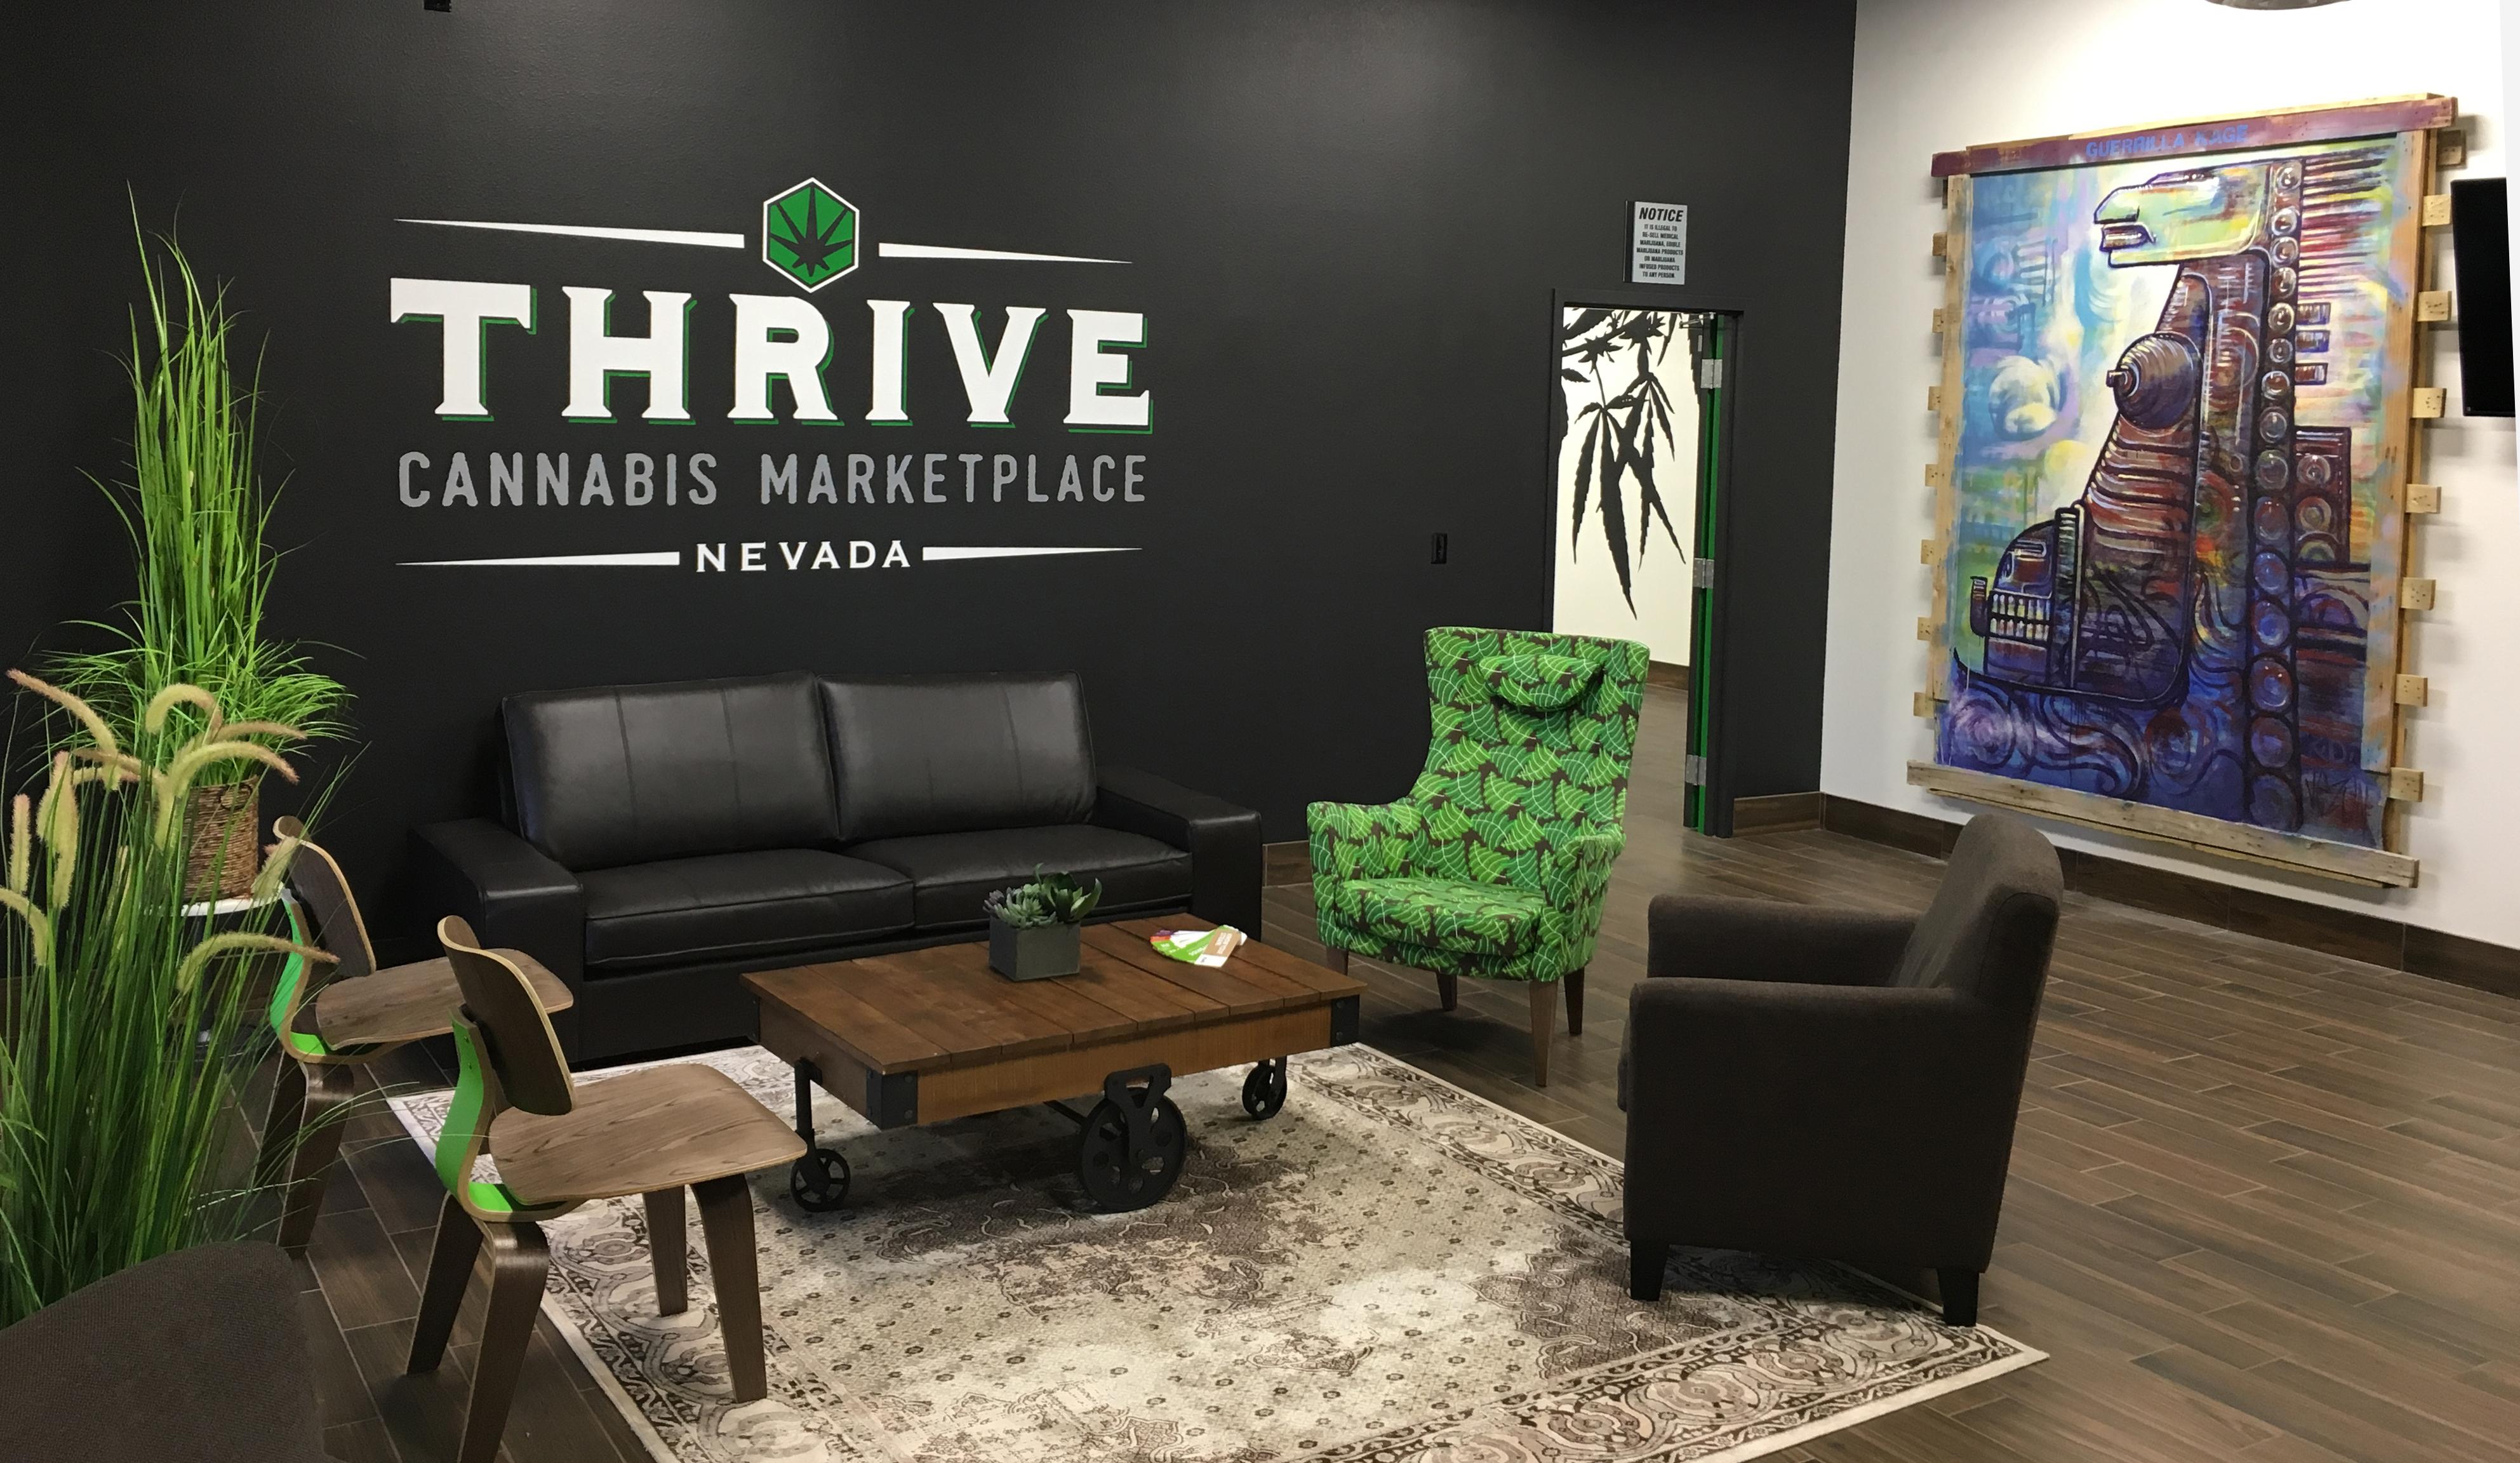 THRIVE lobby